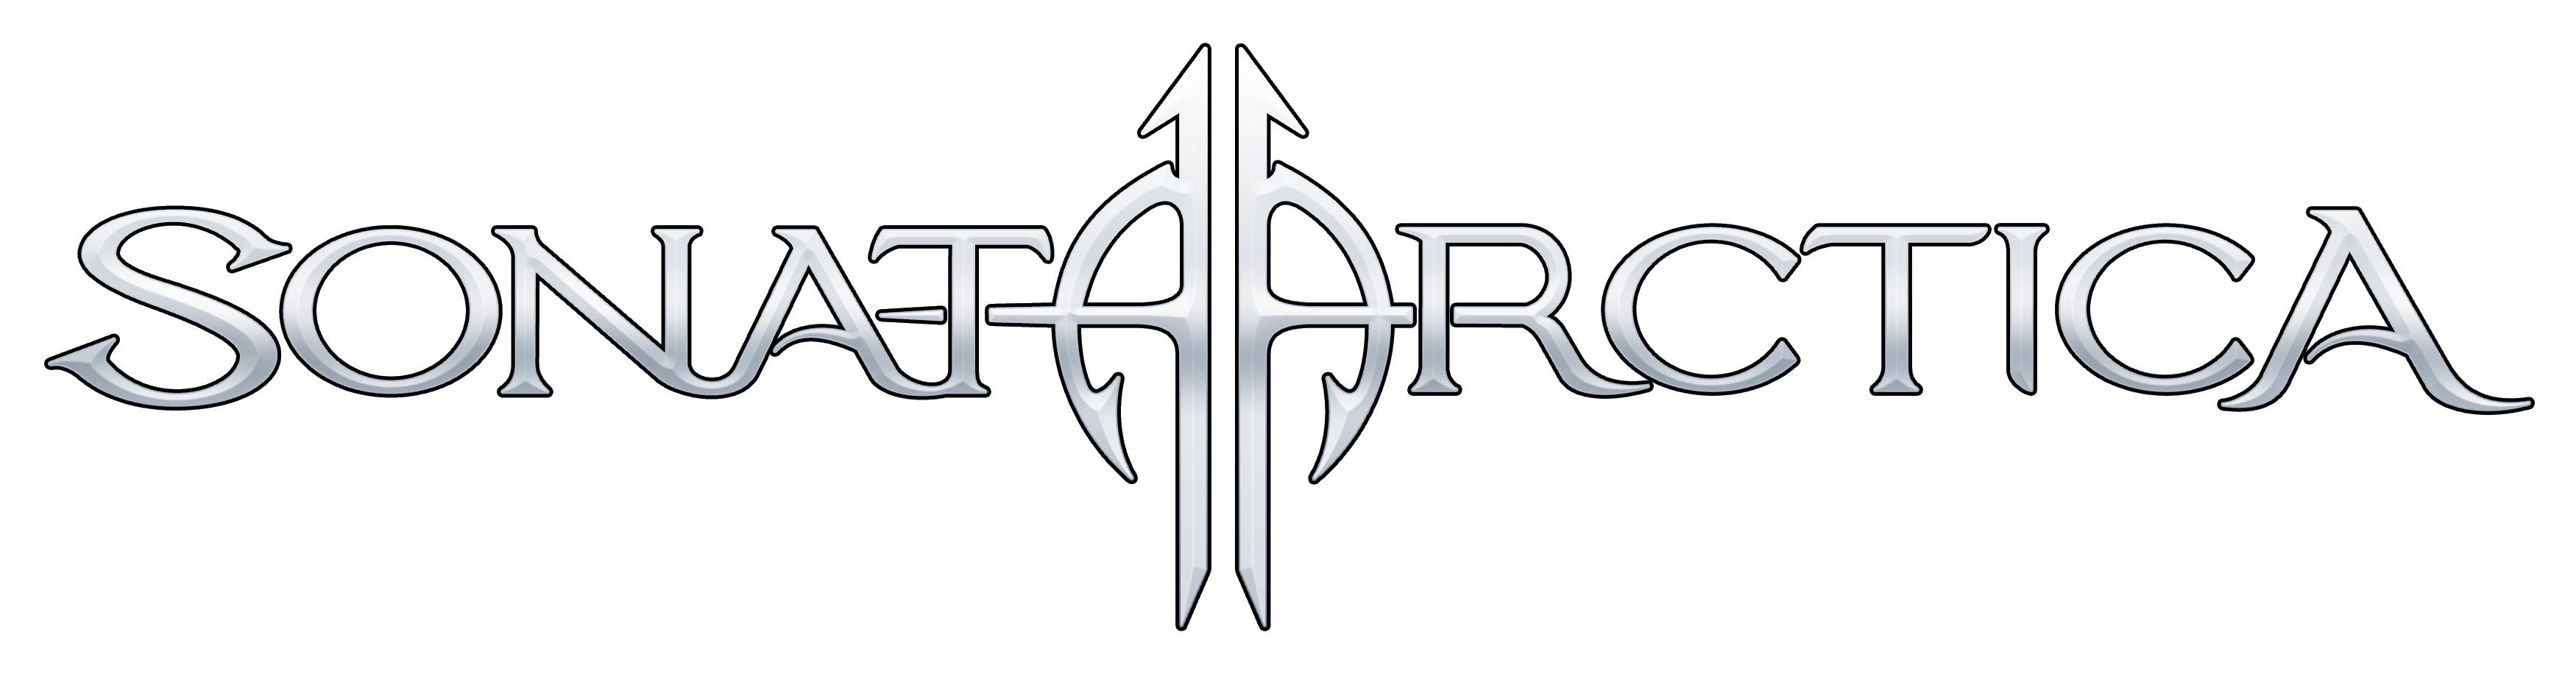 SonataArctica_new_logo2.jpg